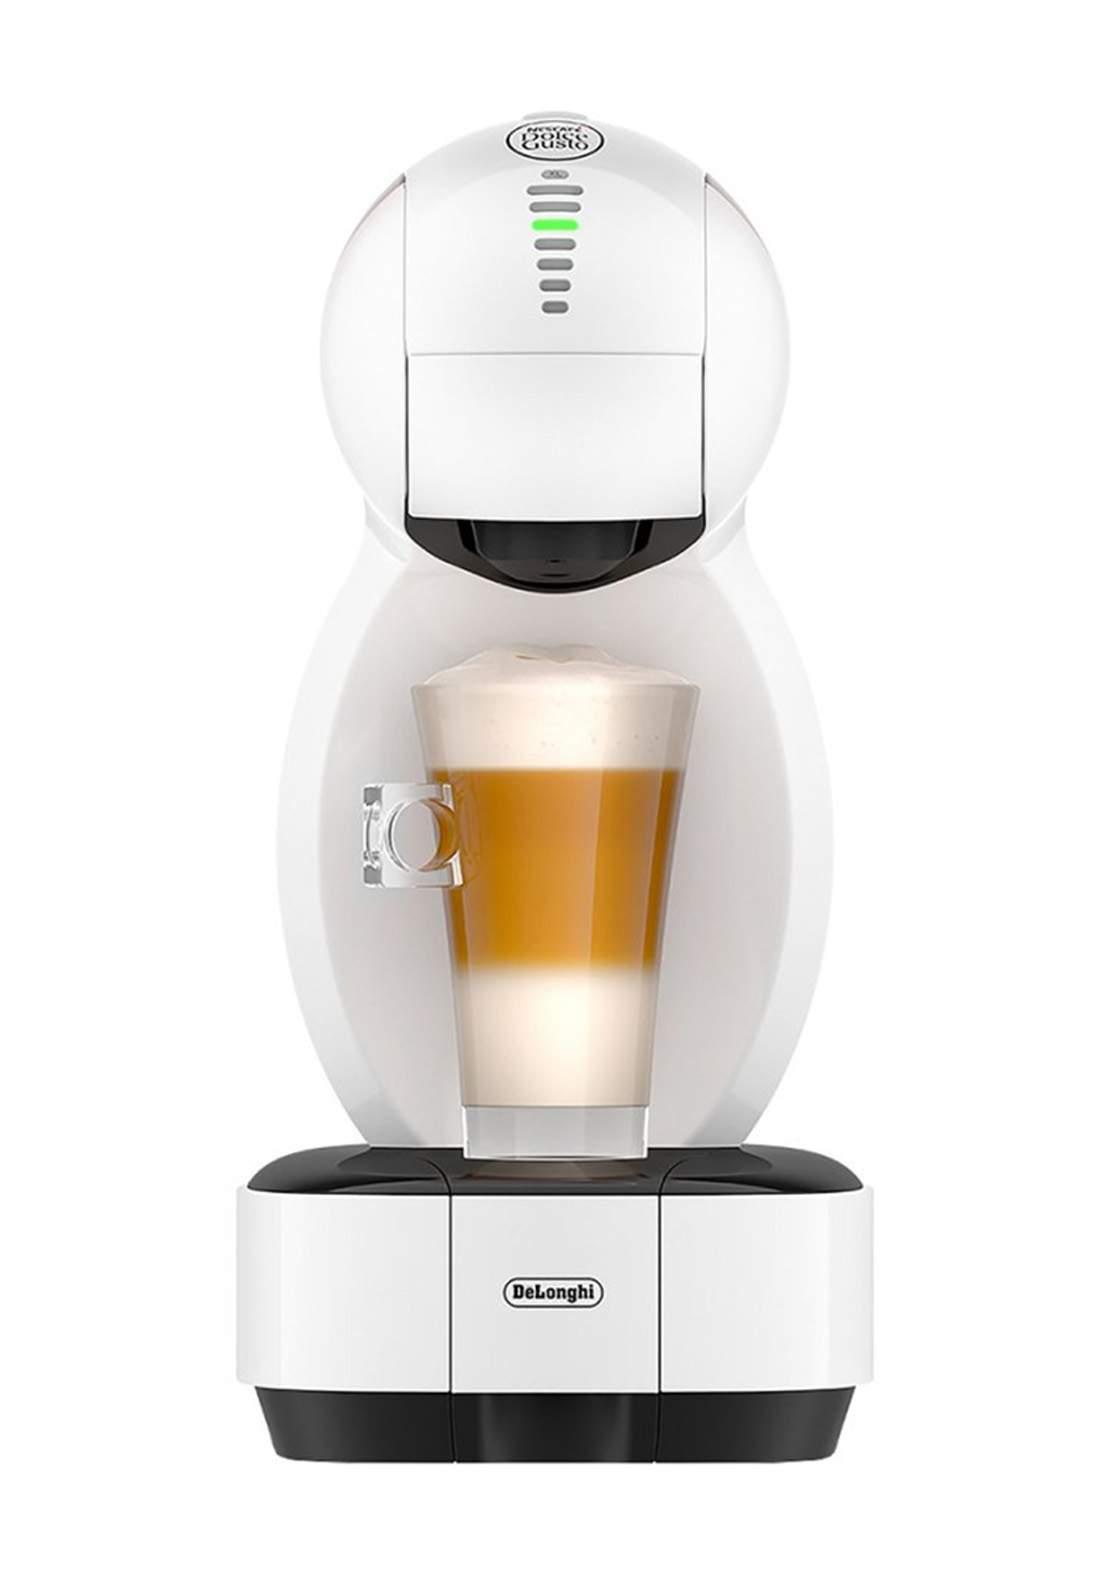 Delonghi EDG355.W1 Coffee Machine 800 Watt ماكنة صنع قهوة